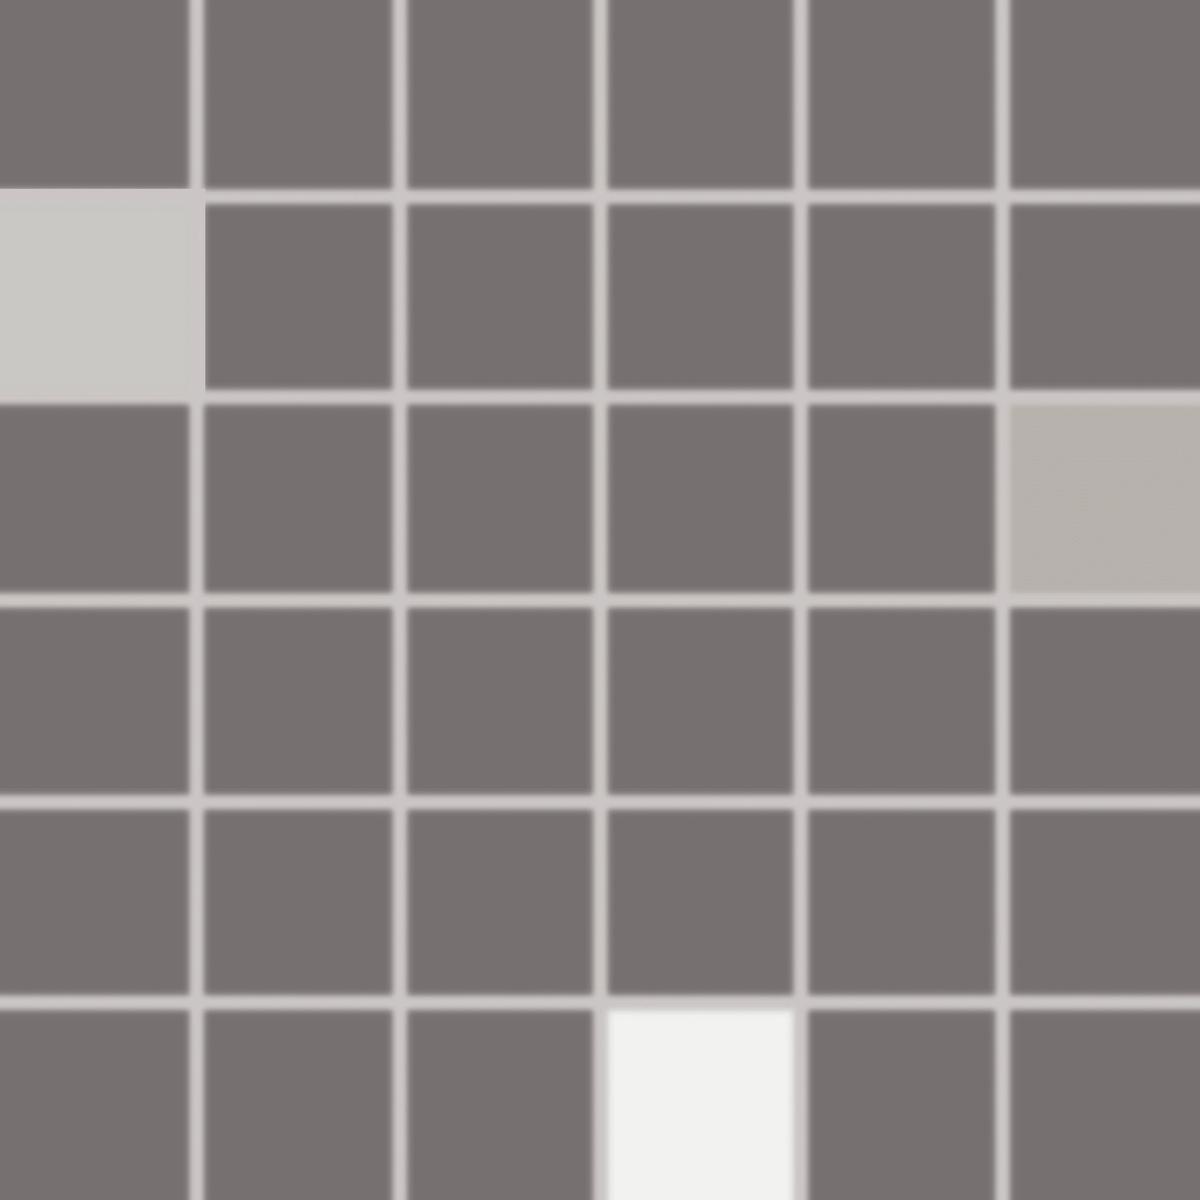 Mozaika Rako Concept Plus tmavo šedá 30x30 cm lesk WDM05011.1